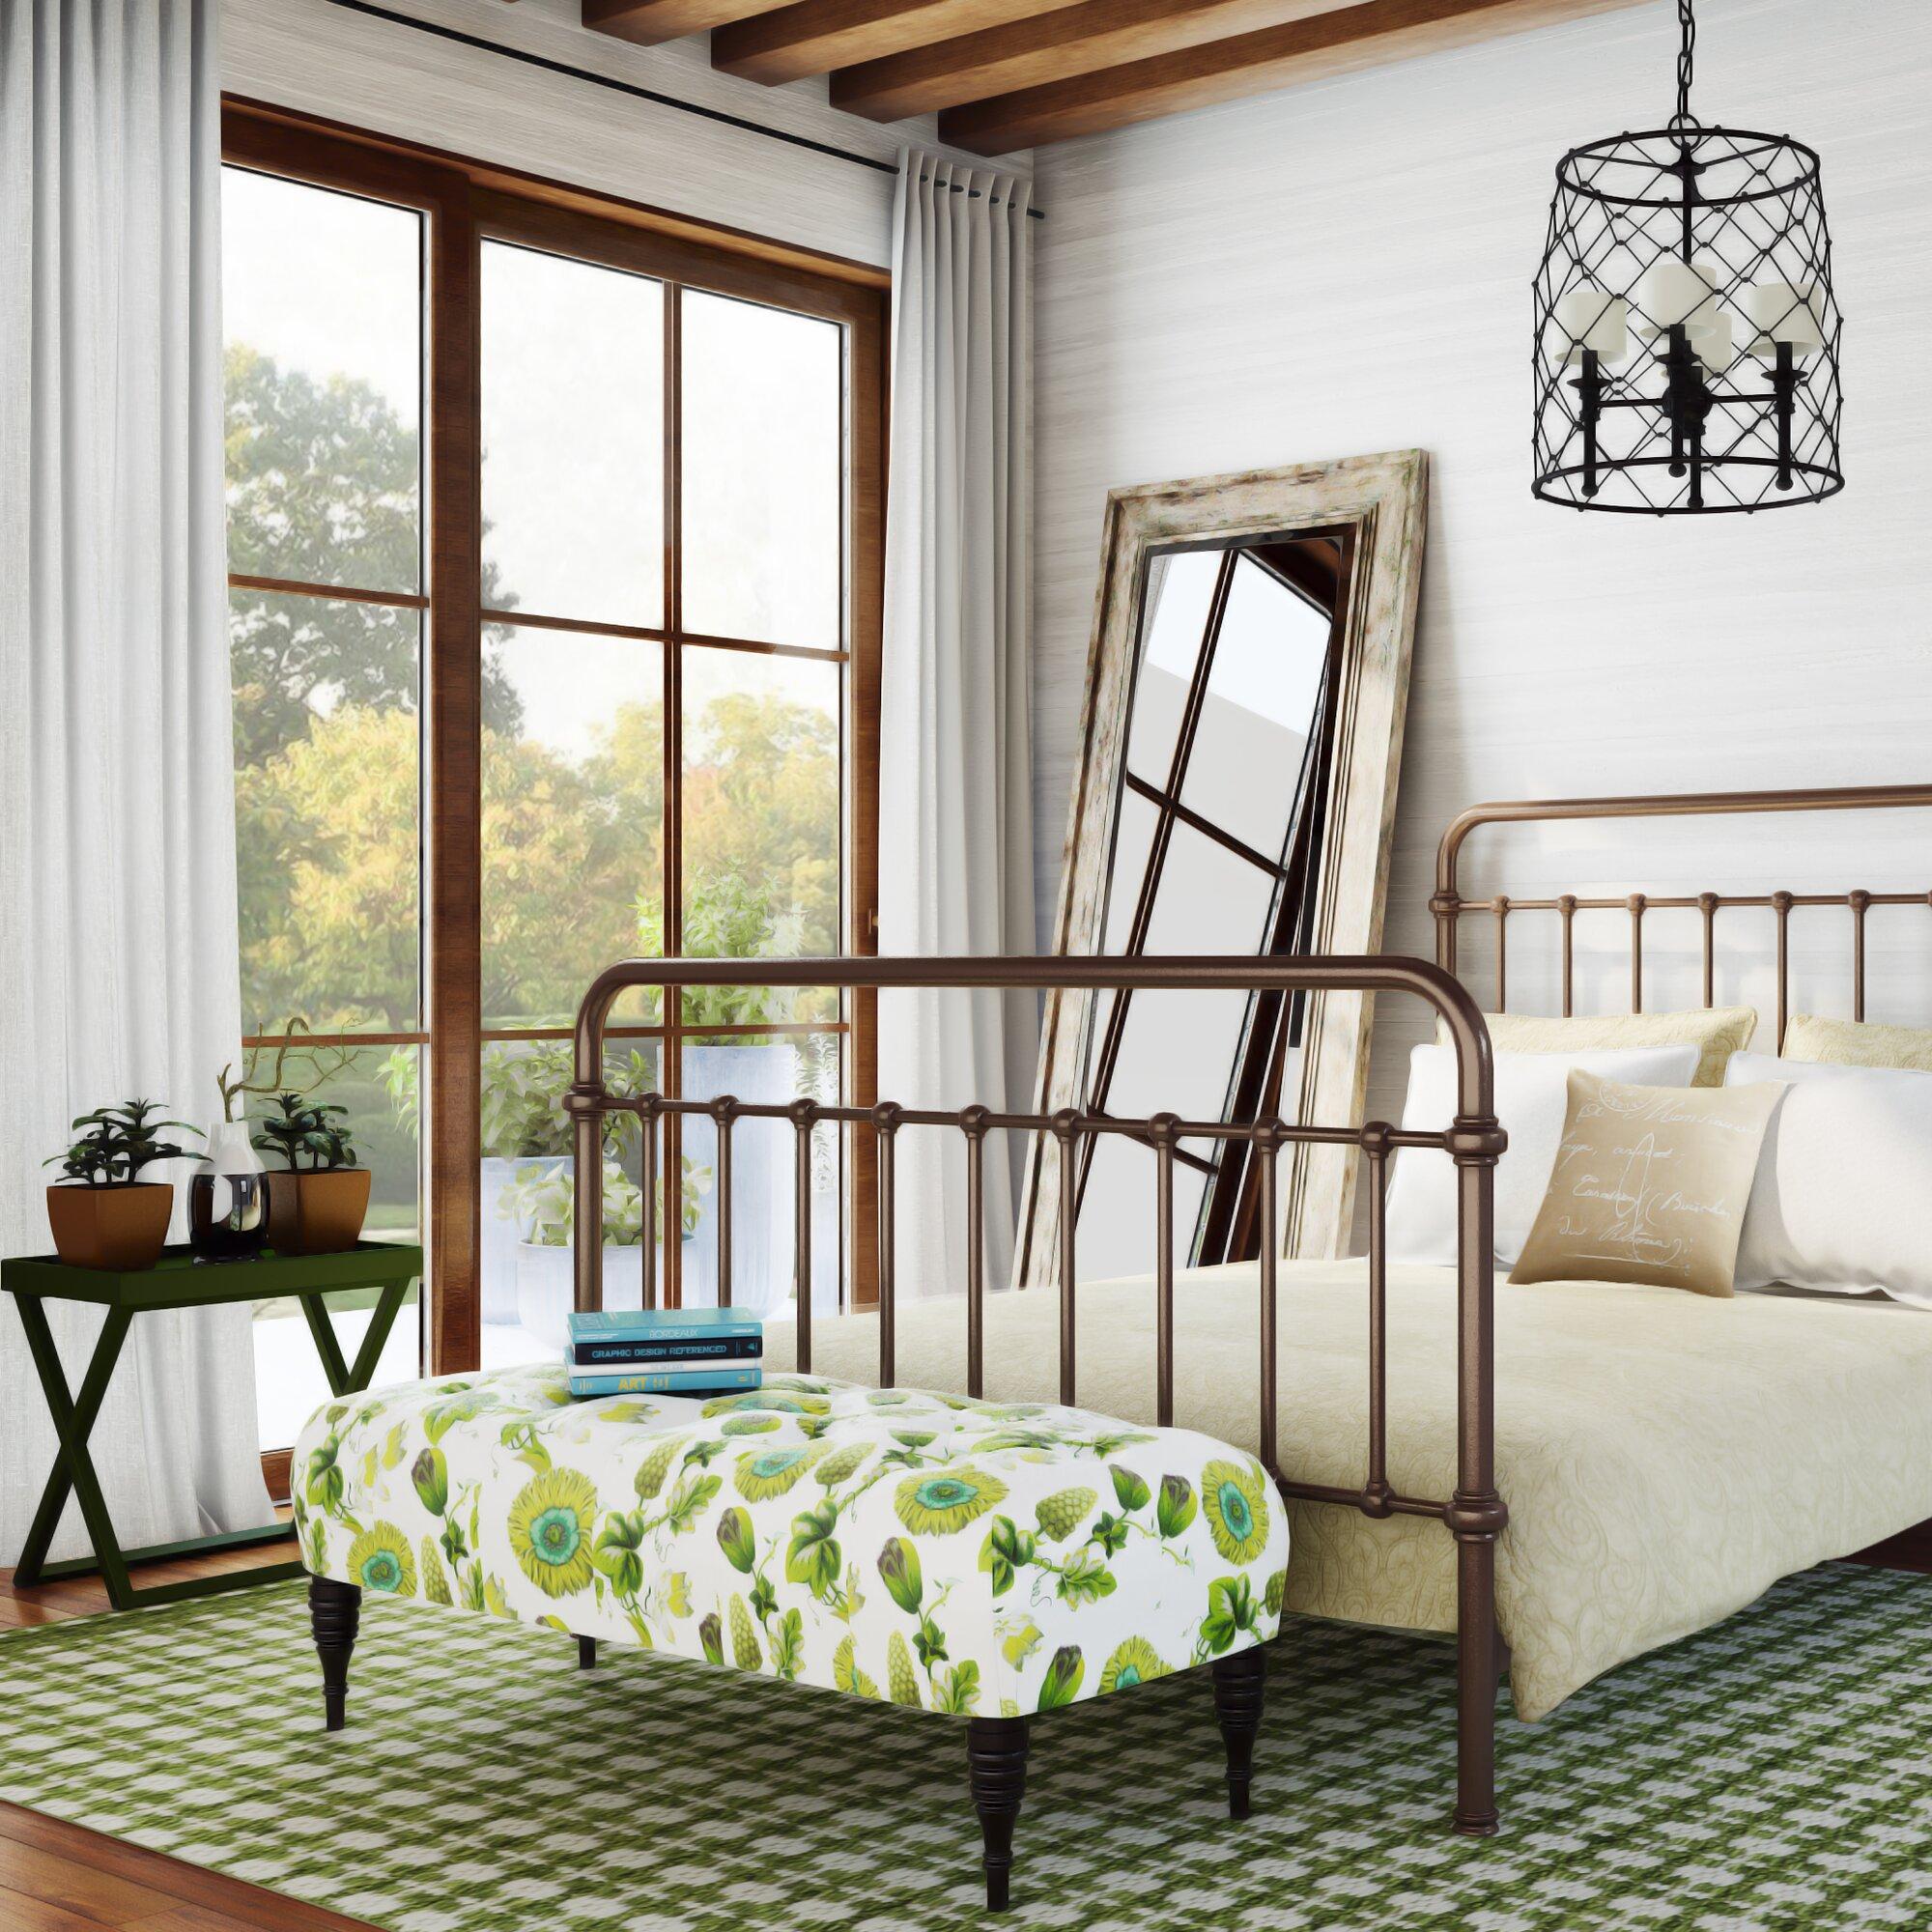 August Grove Acelina Tufted Linen Upholstered Bedroom Bench ...